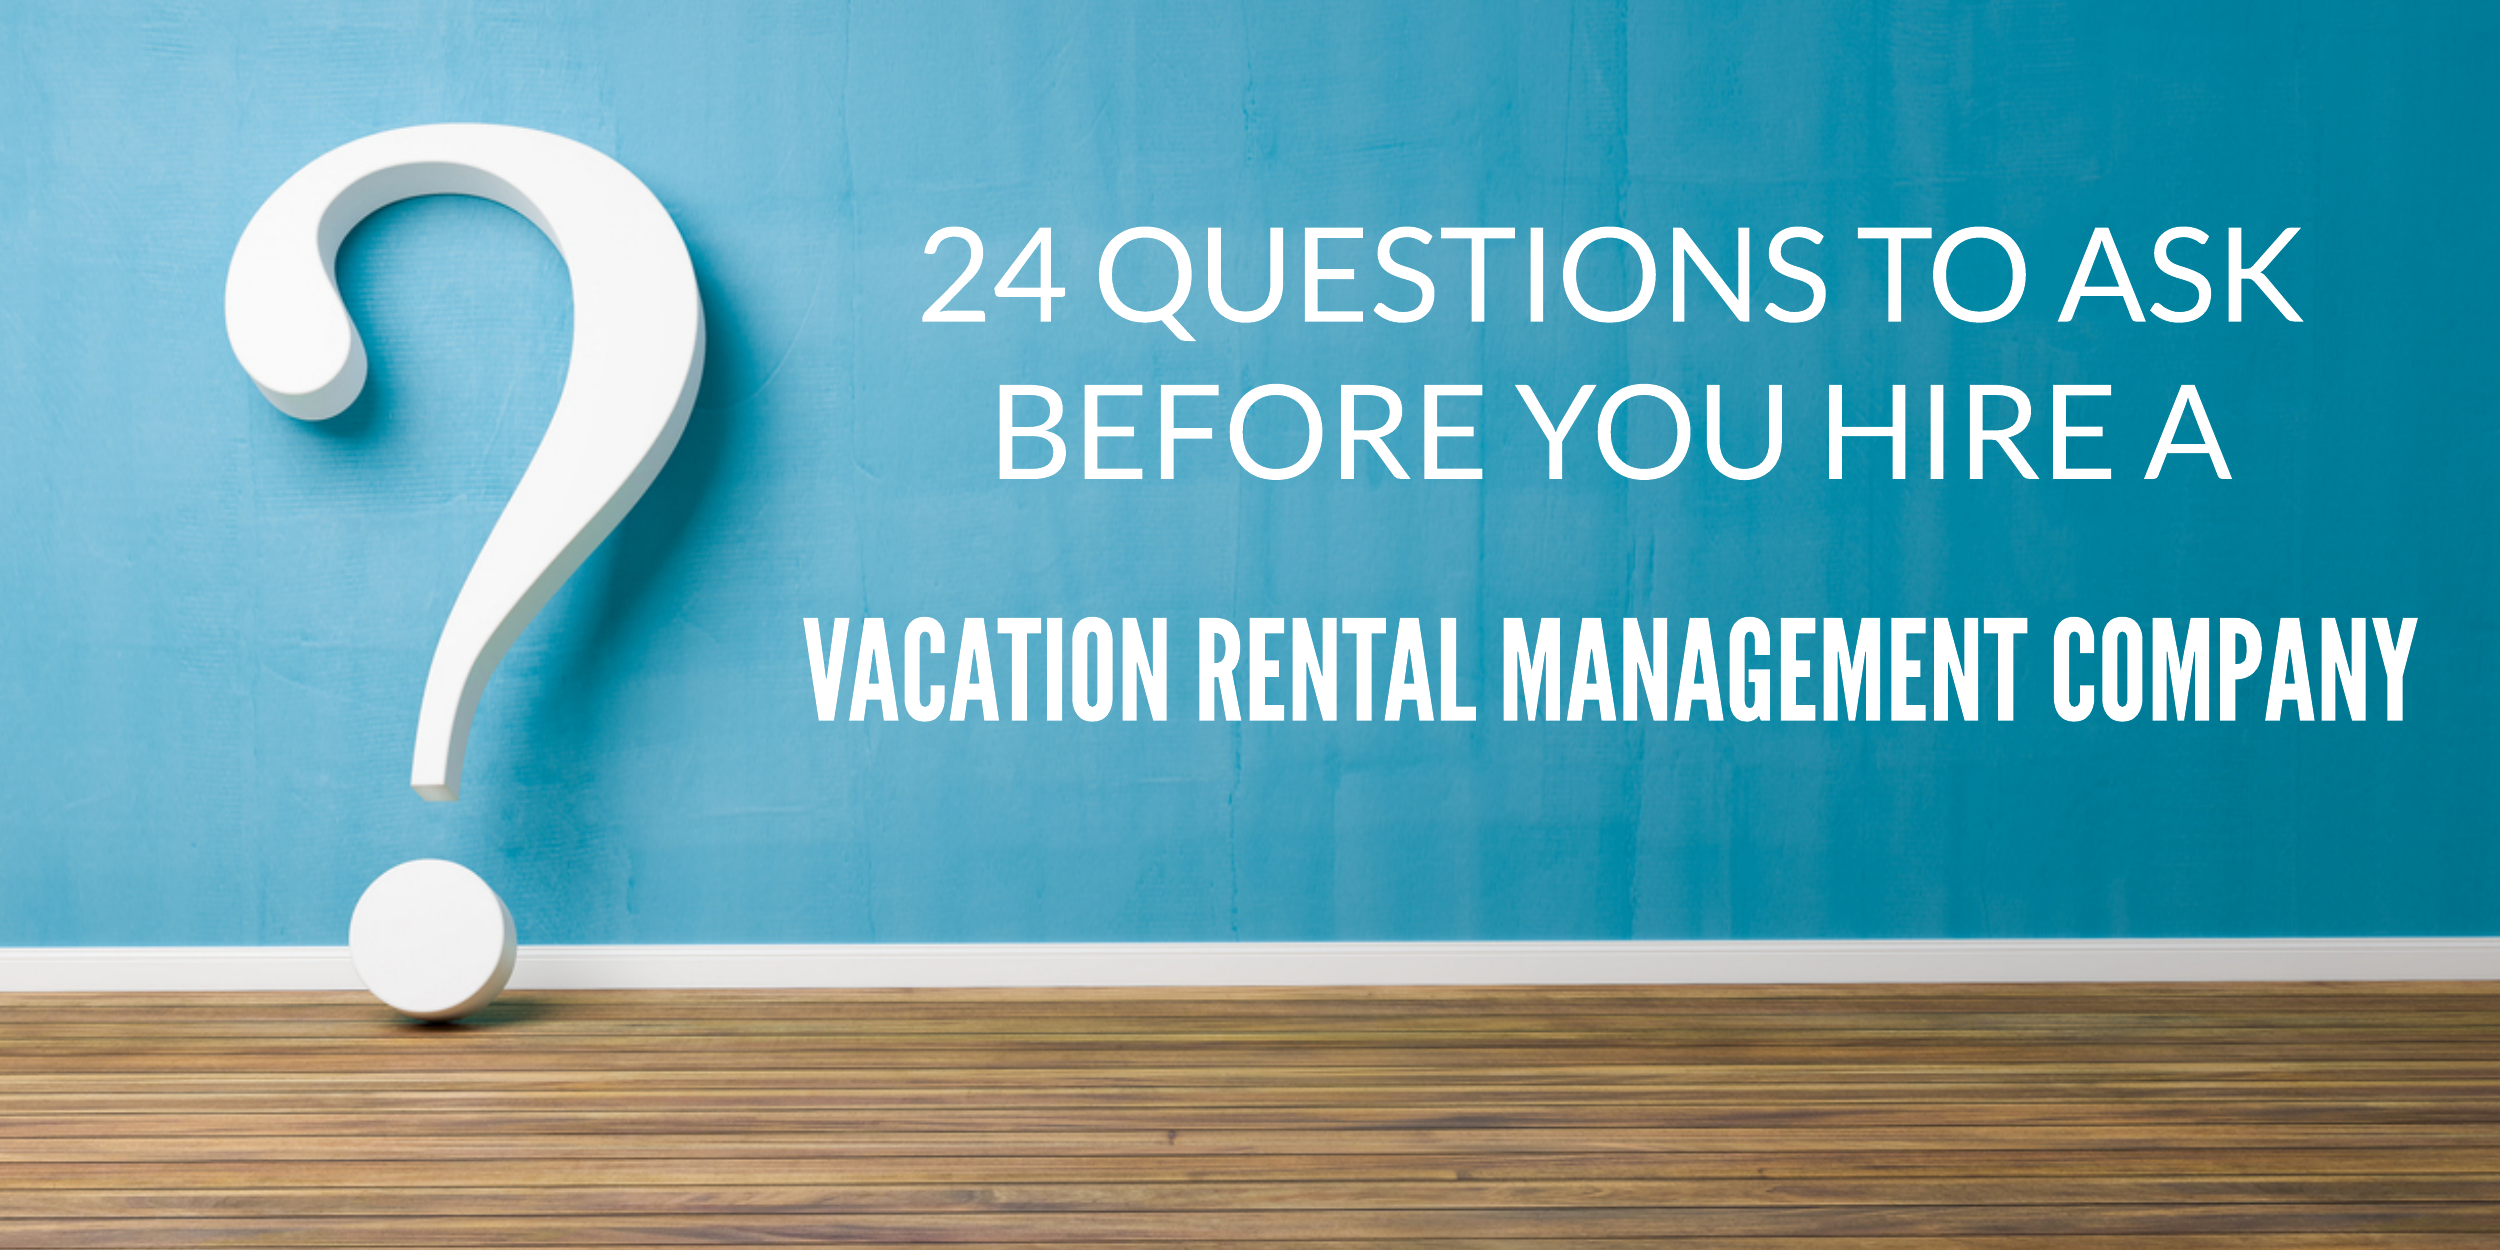 Questions 24 Questions Before Hiring a Vacation Rental Management Company Hiring Vacation Rental Company